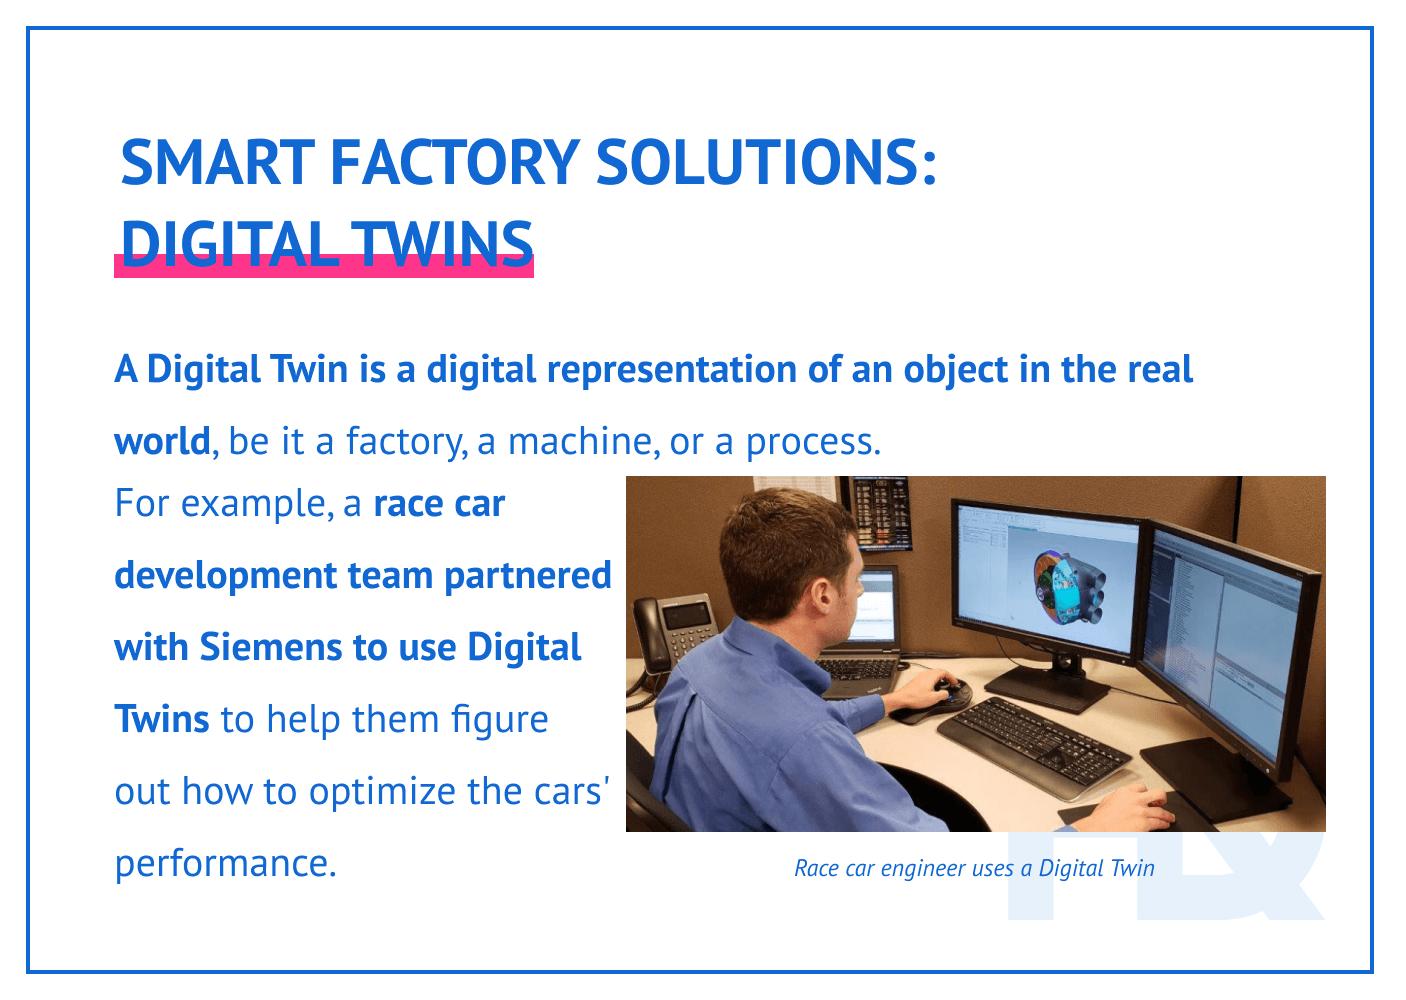 Smart factory solutions: Digital Twins.